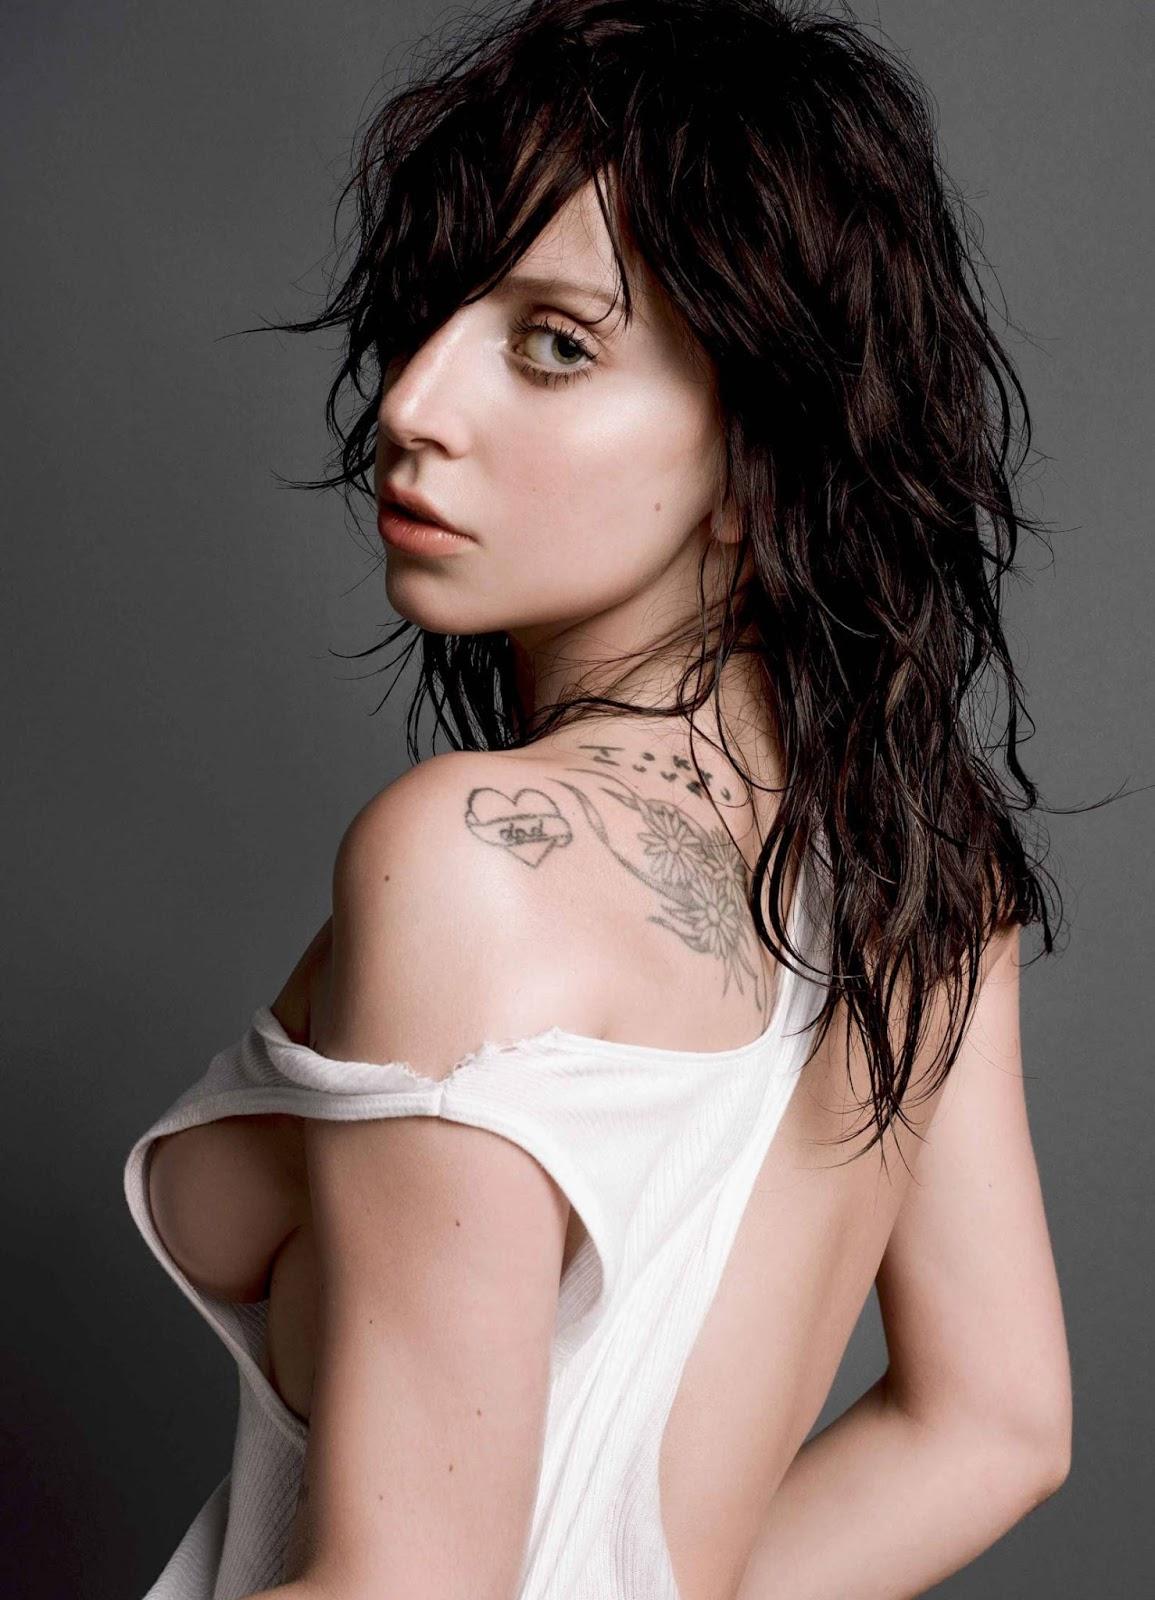 http://4.bp.blogspot.com/-12zH5LNZg8o/UhZm1xL0HFI/AAAAAAAANrg/BmTiVCX_zL0/s1600/Lady-Gaga-10.jpg